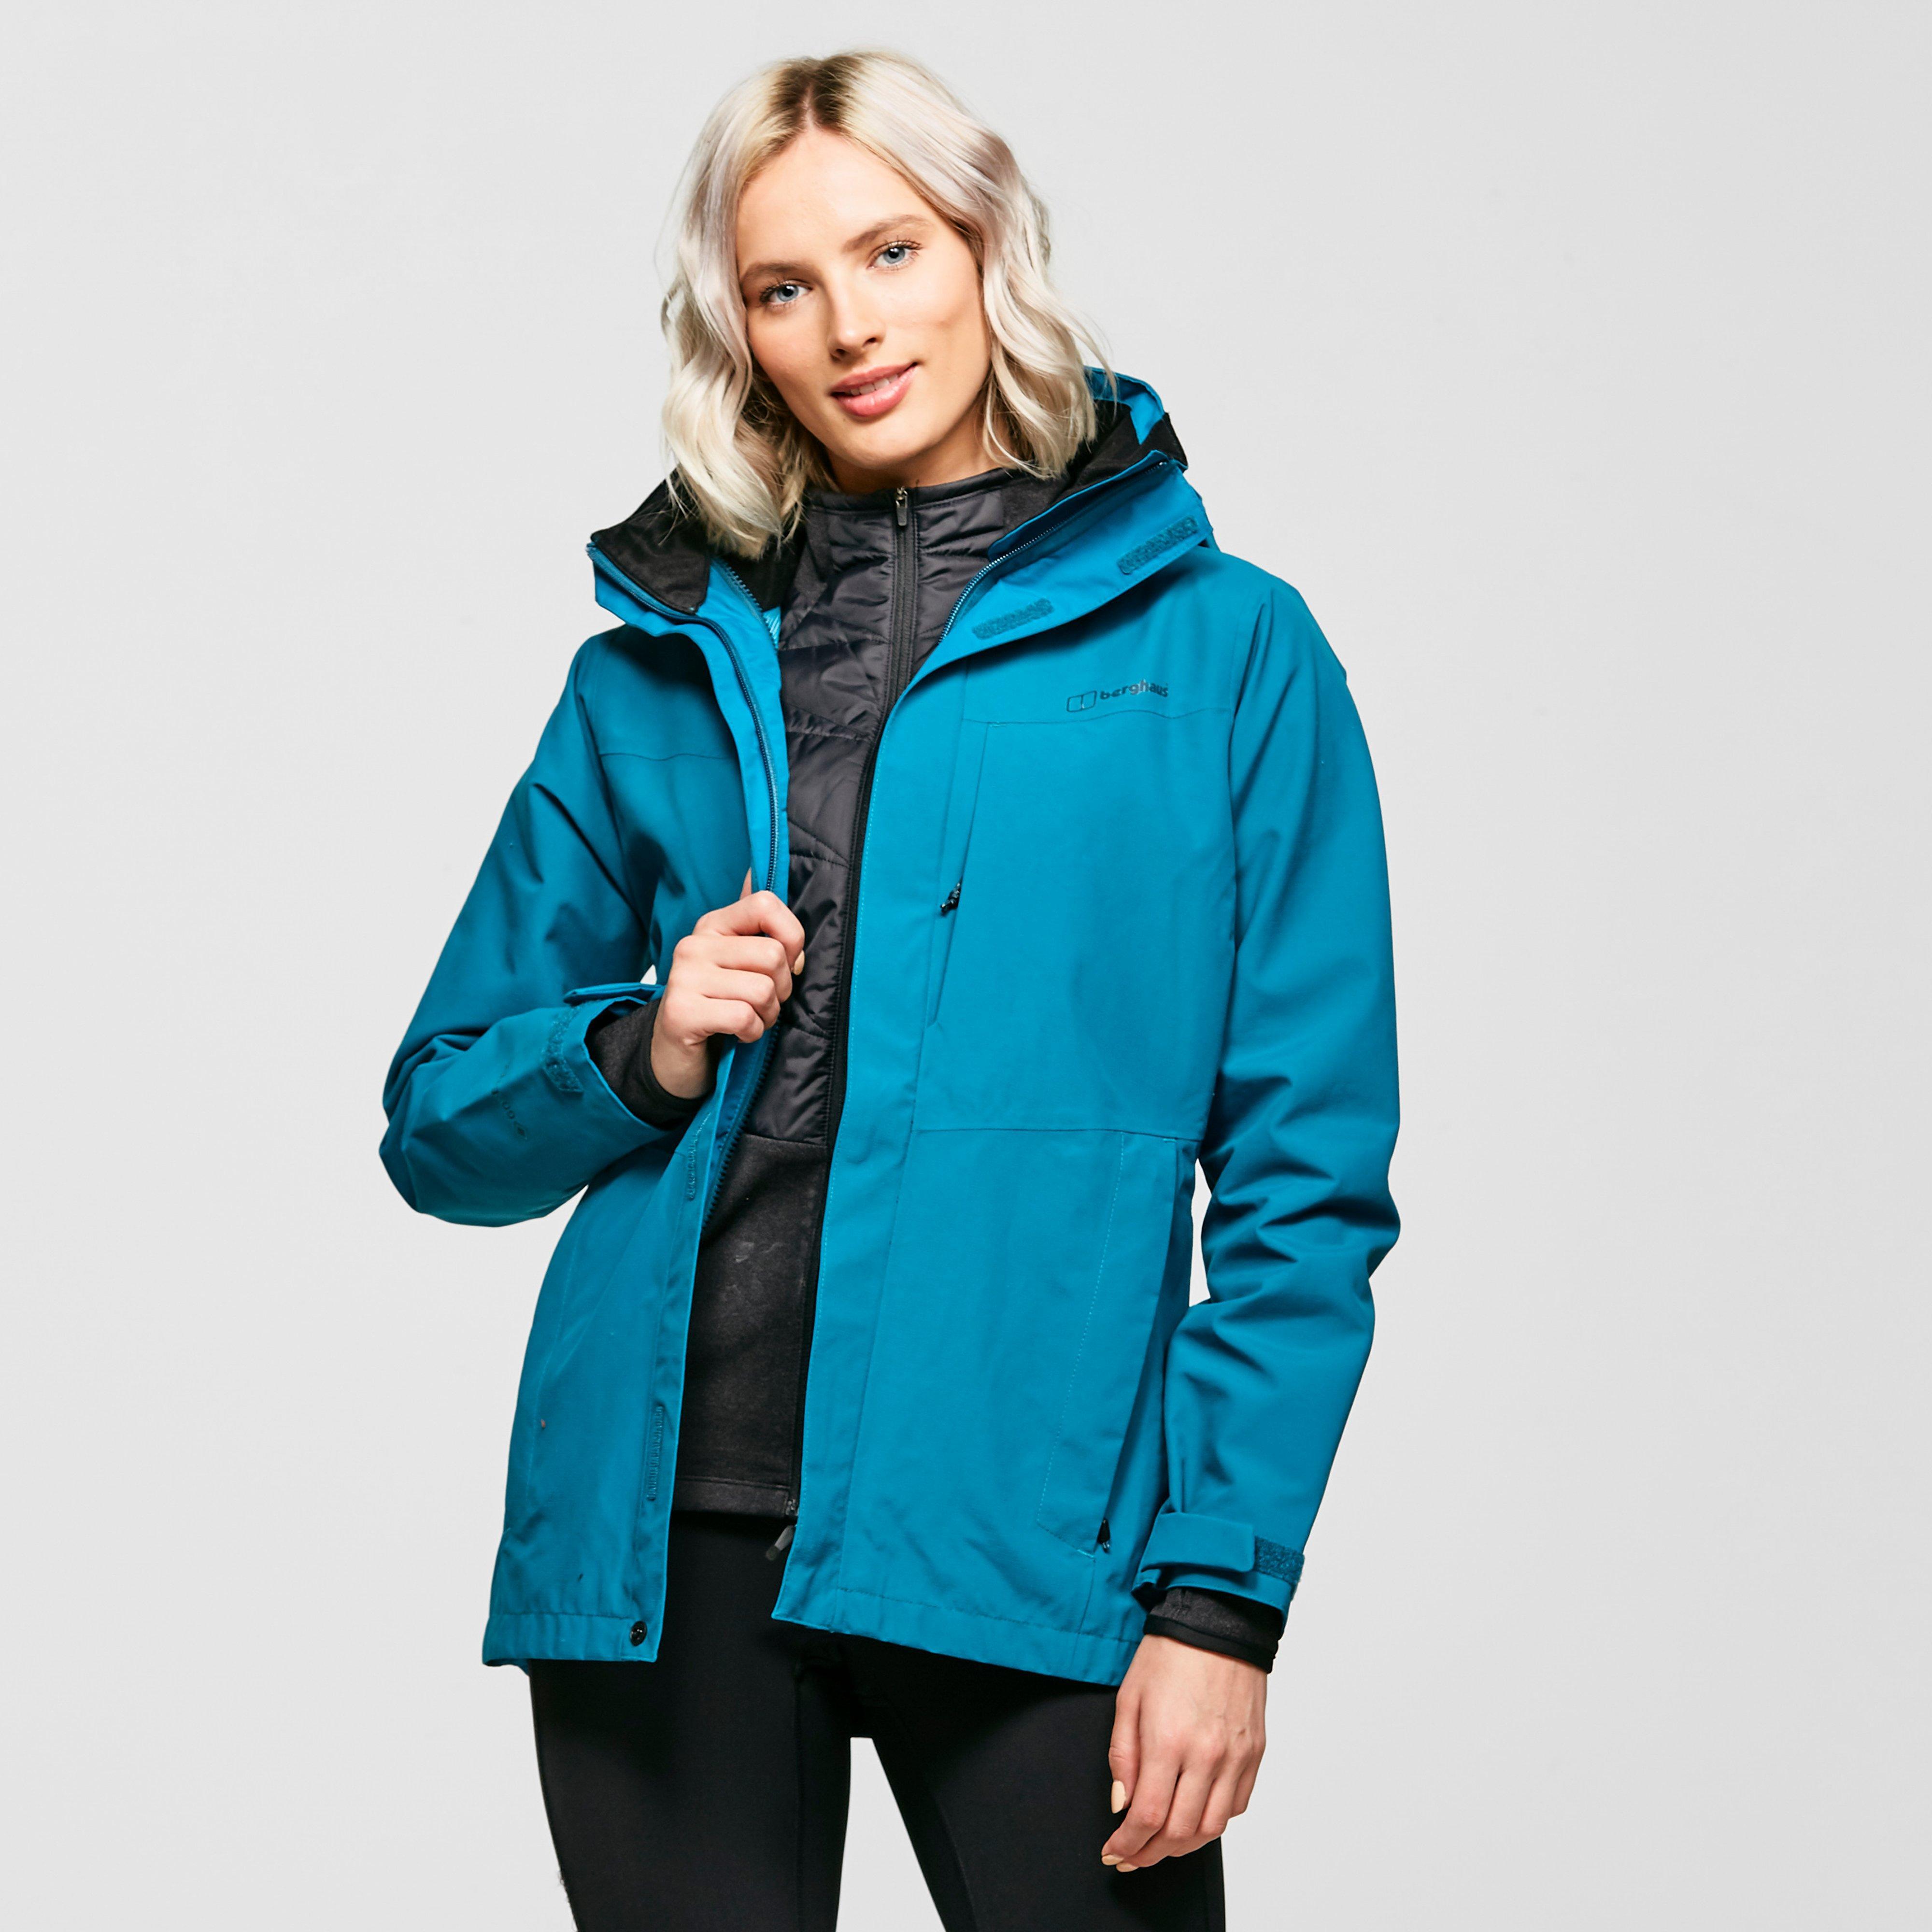 Berghaus Womens Maitland Gore-tex Jacket - Blue/blu  Blue/blu